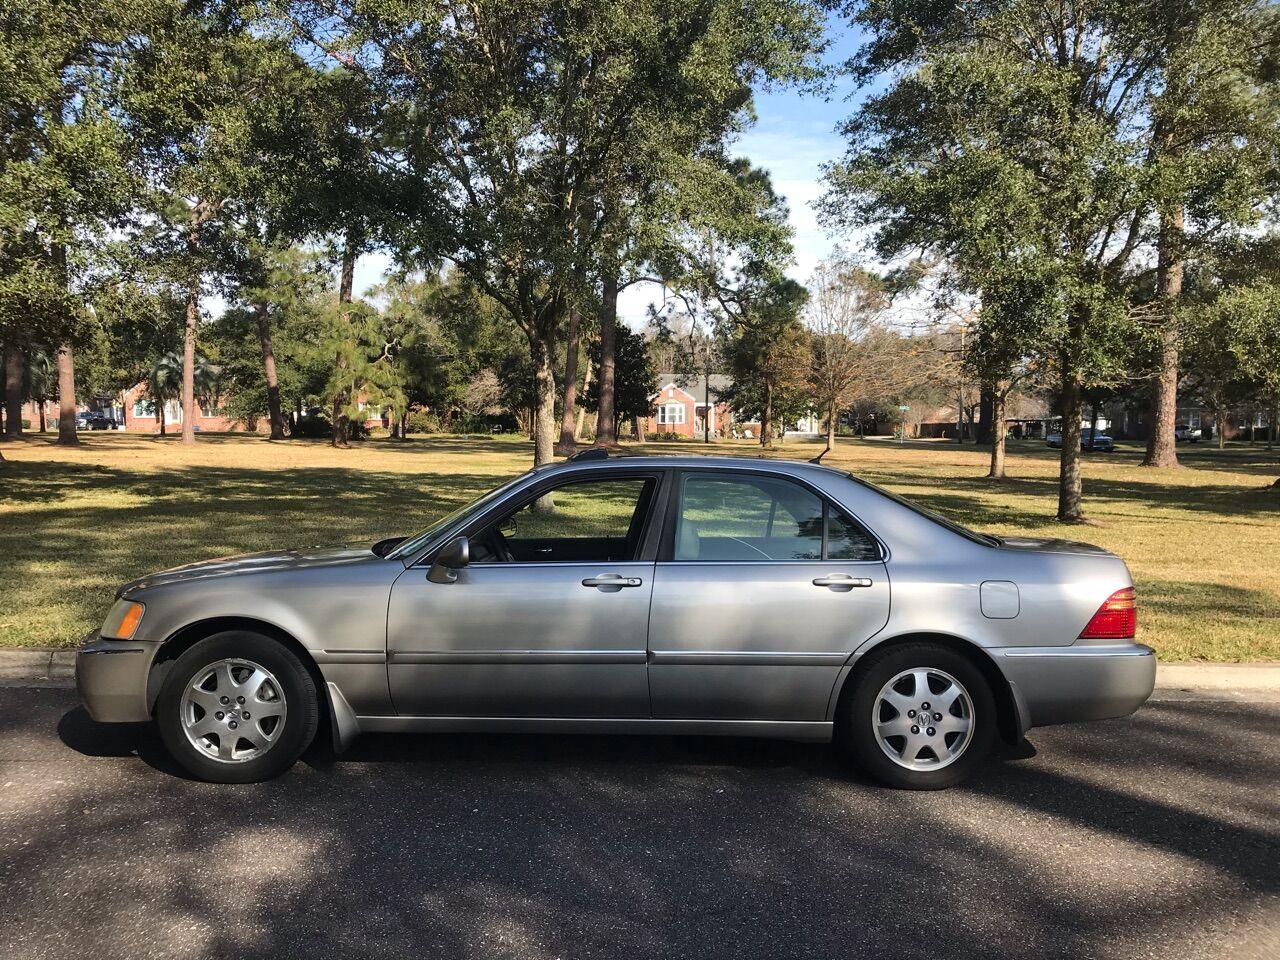 Used 2002 Acura Rl For Sale Carsforsale Com